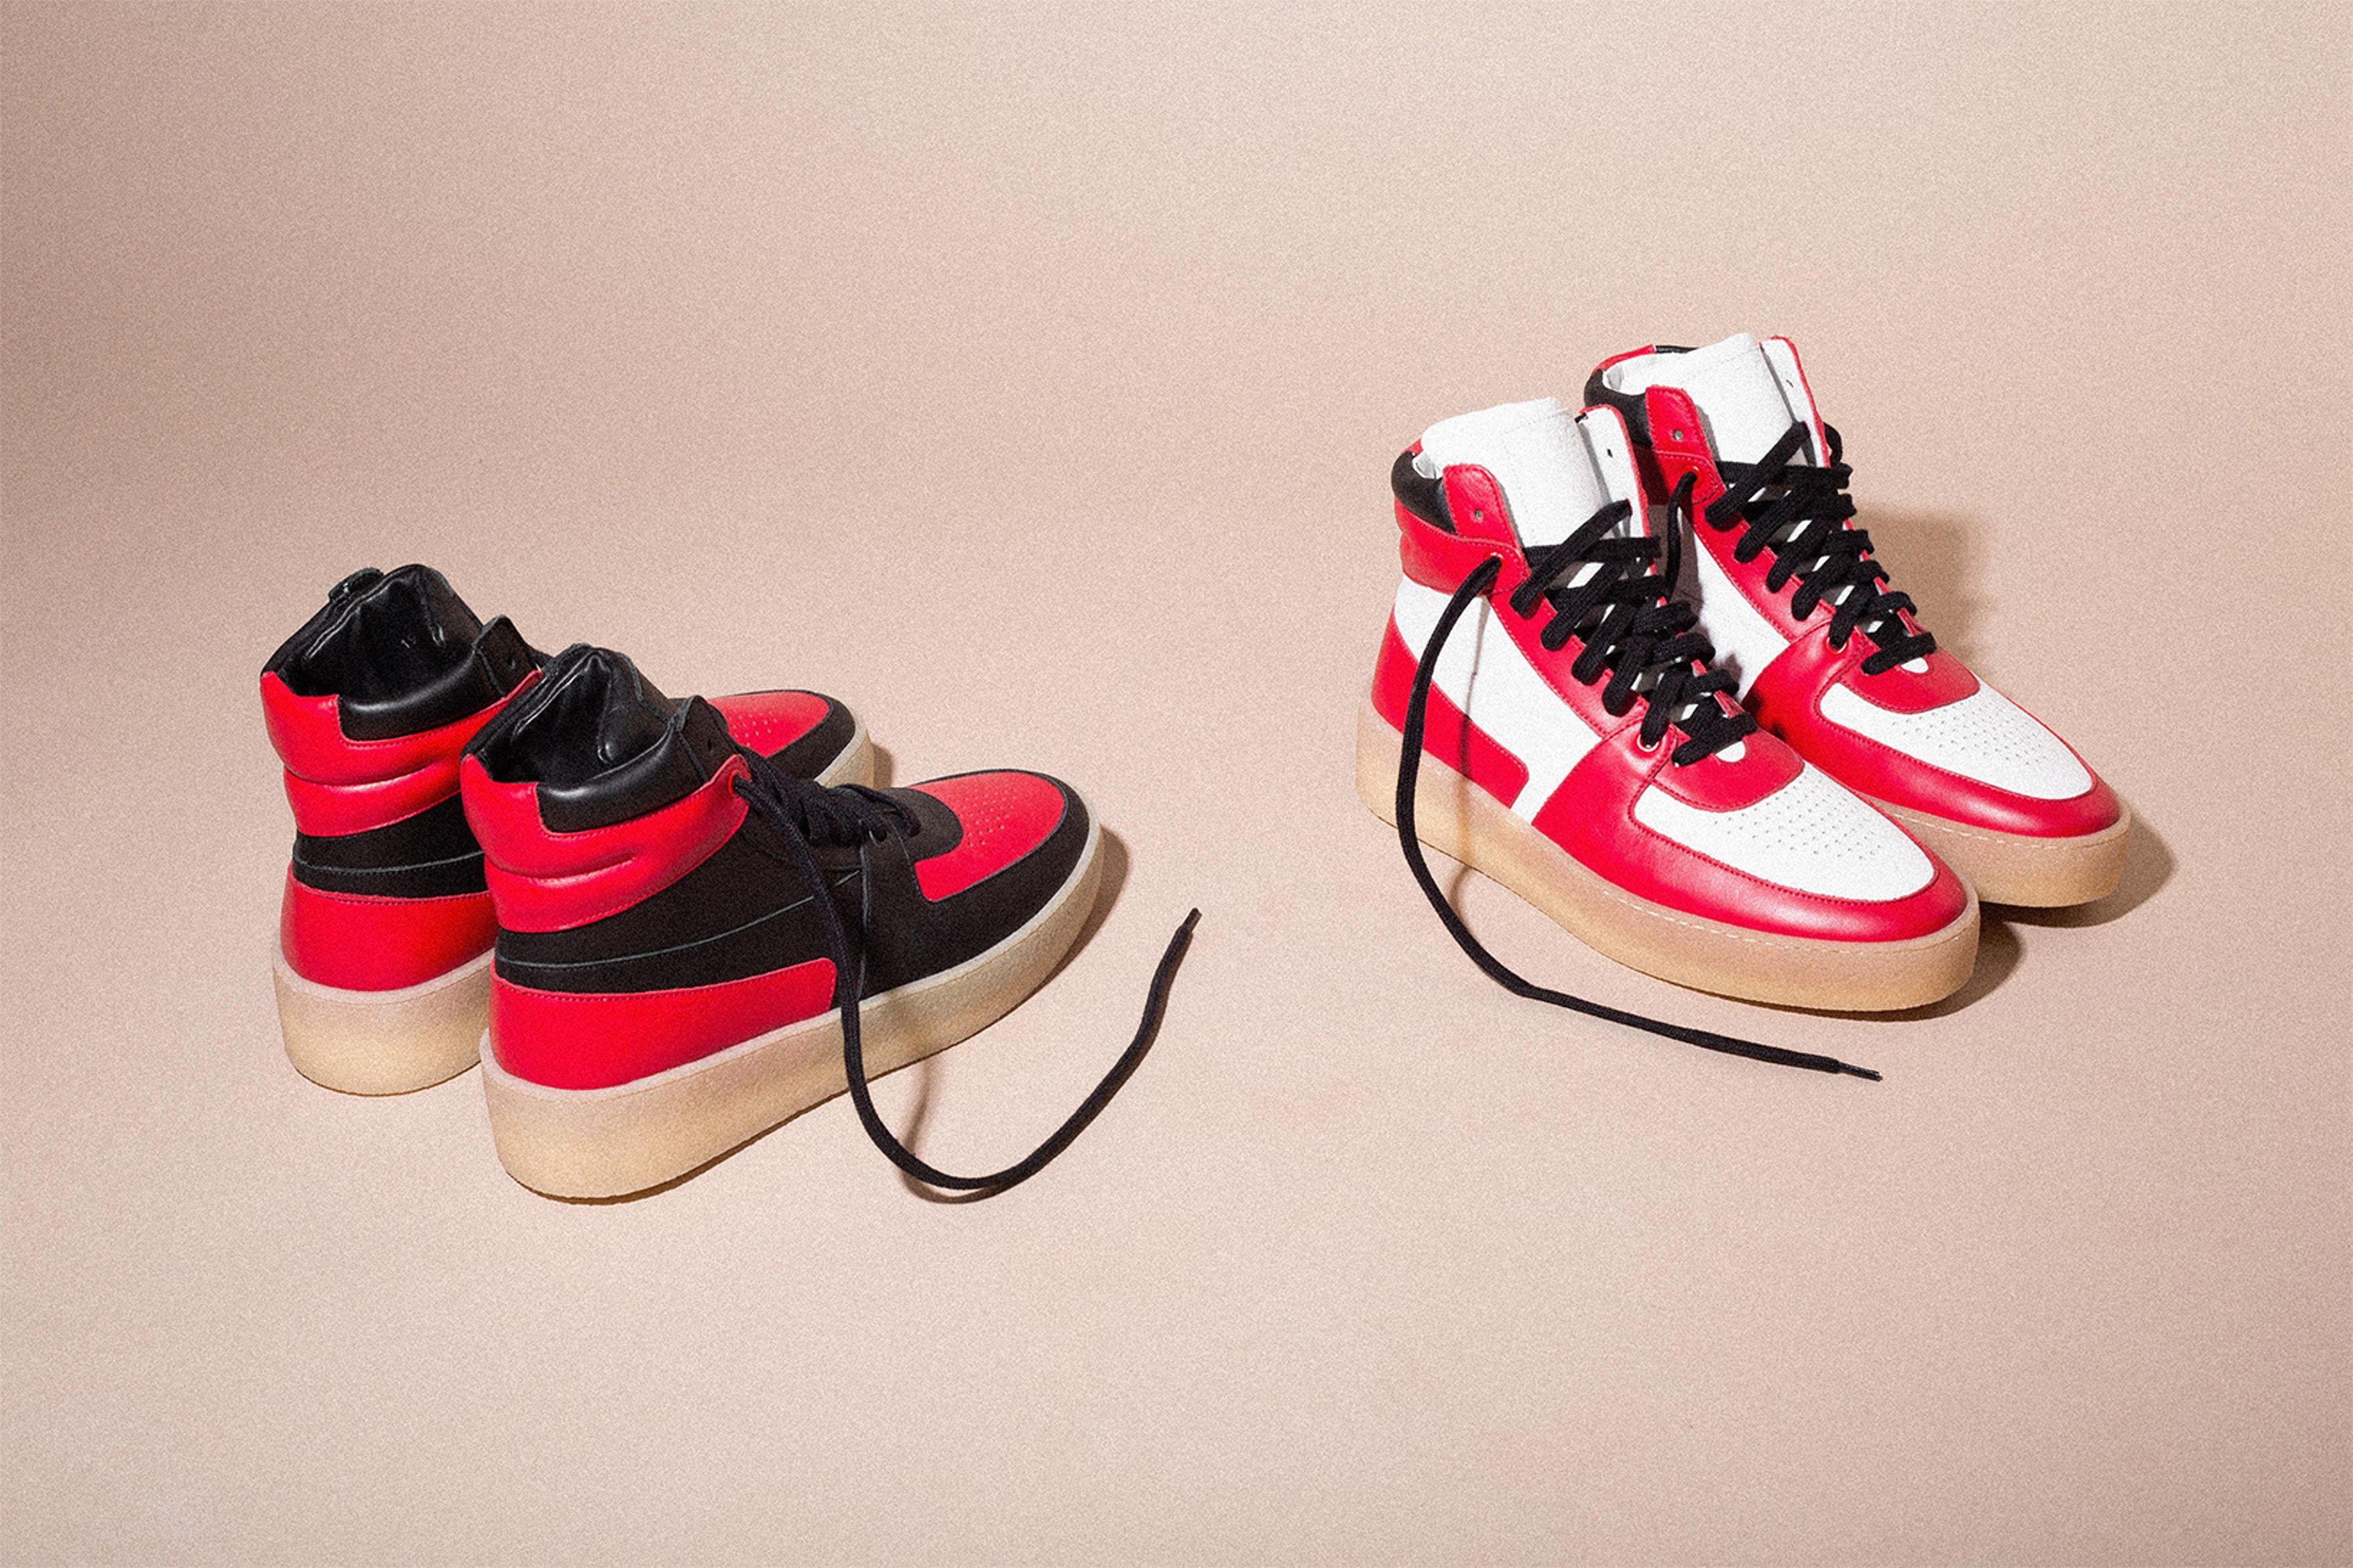 Ndg Studio 1984 Sneaker Gum Sole Pack 2 Sneaker Freaker